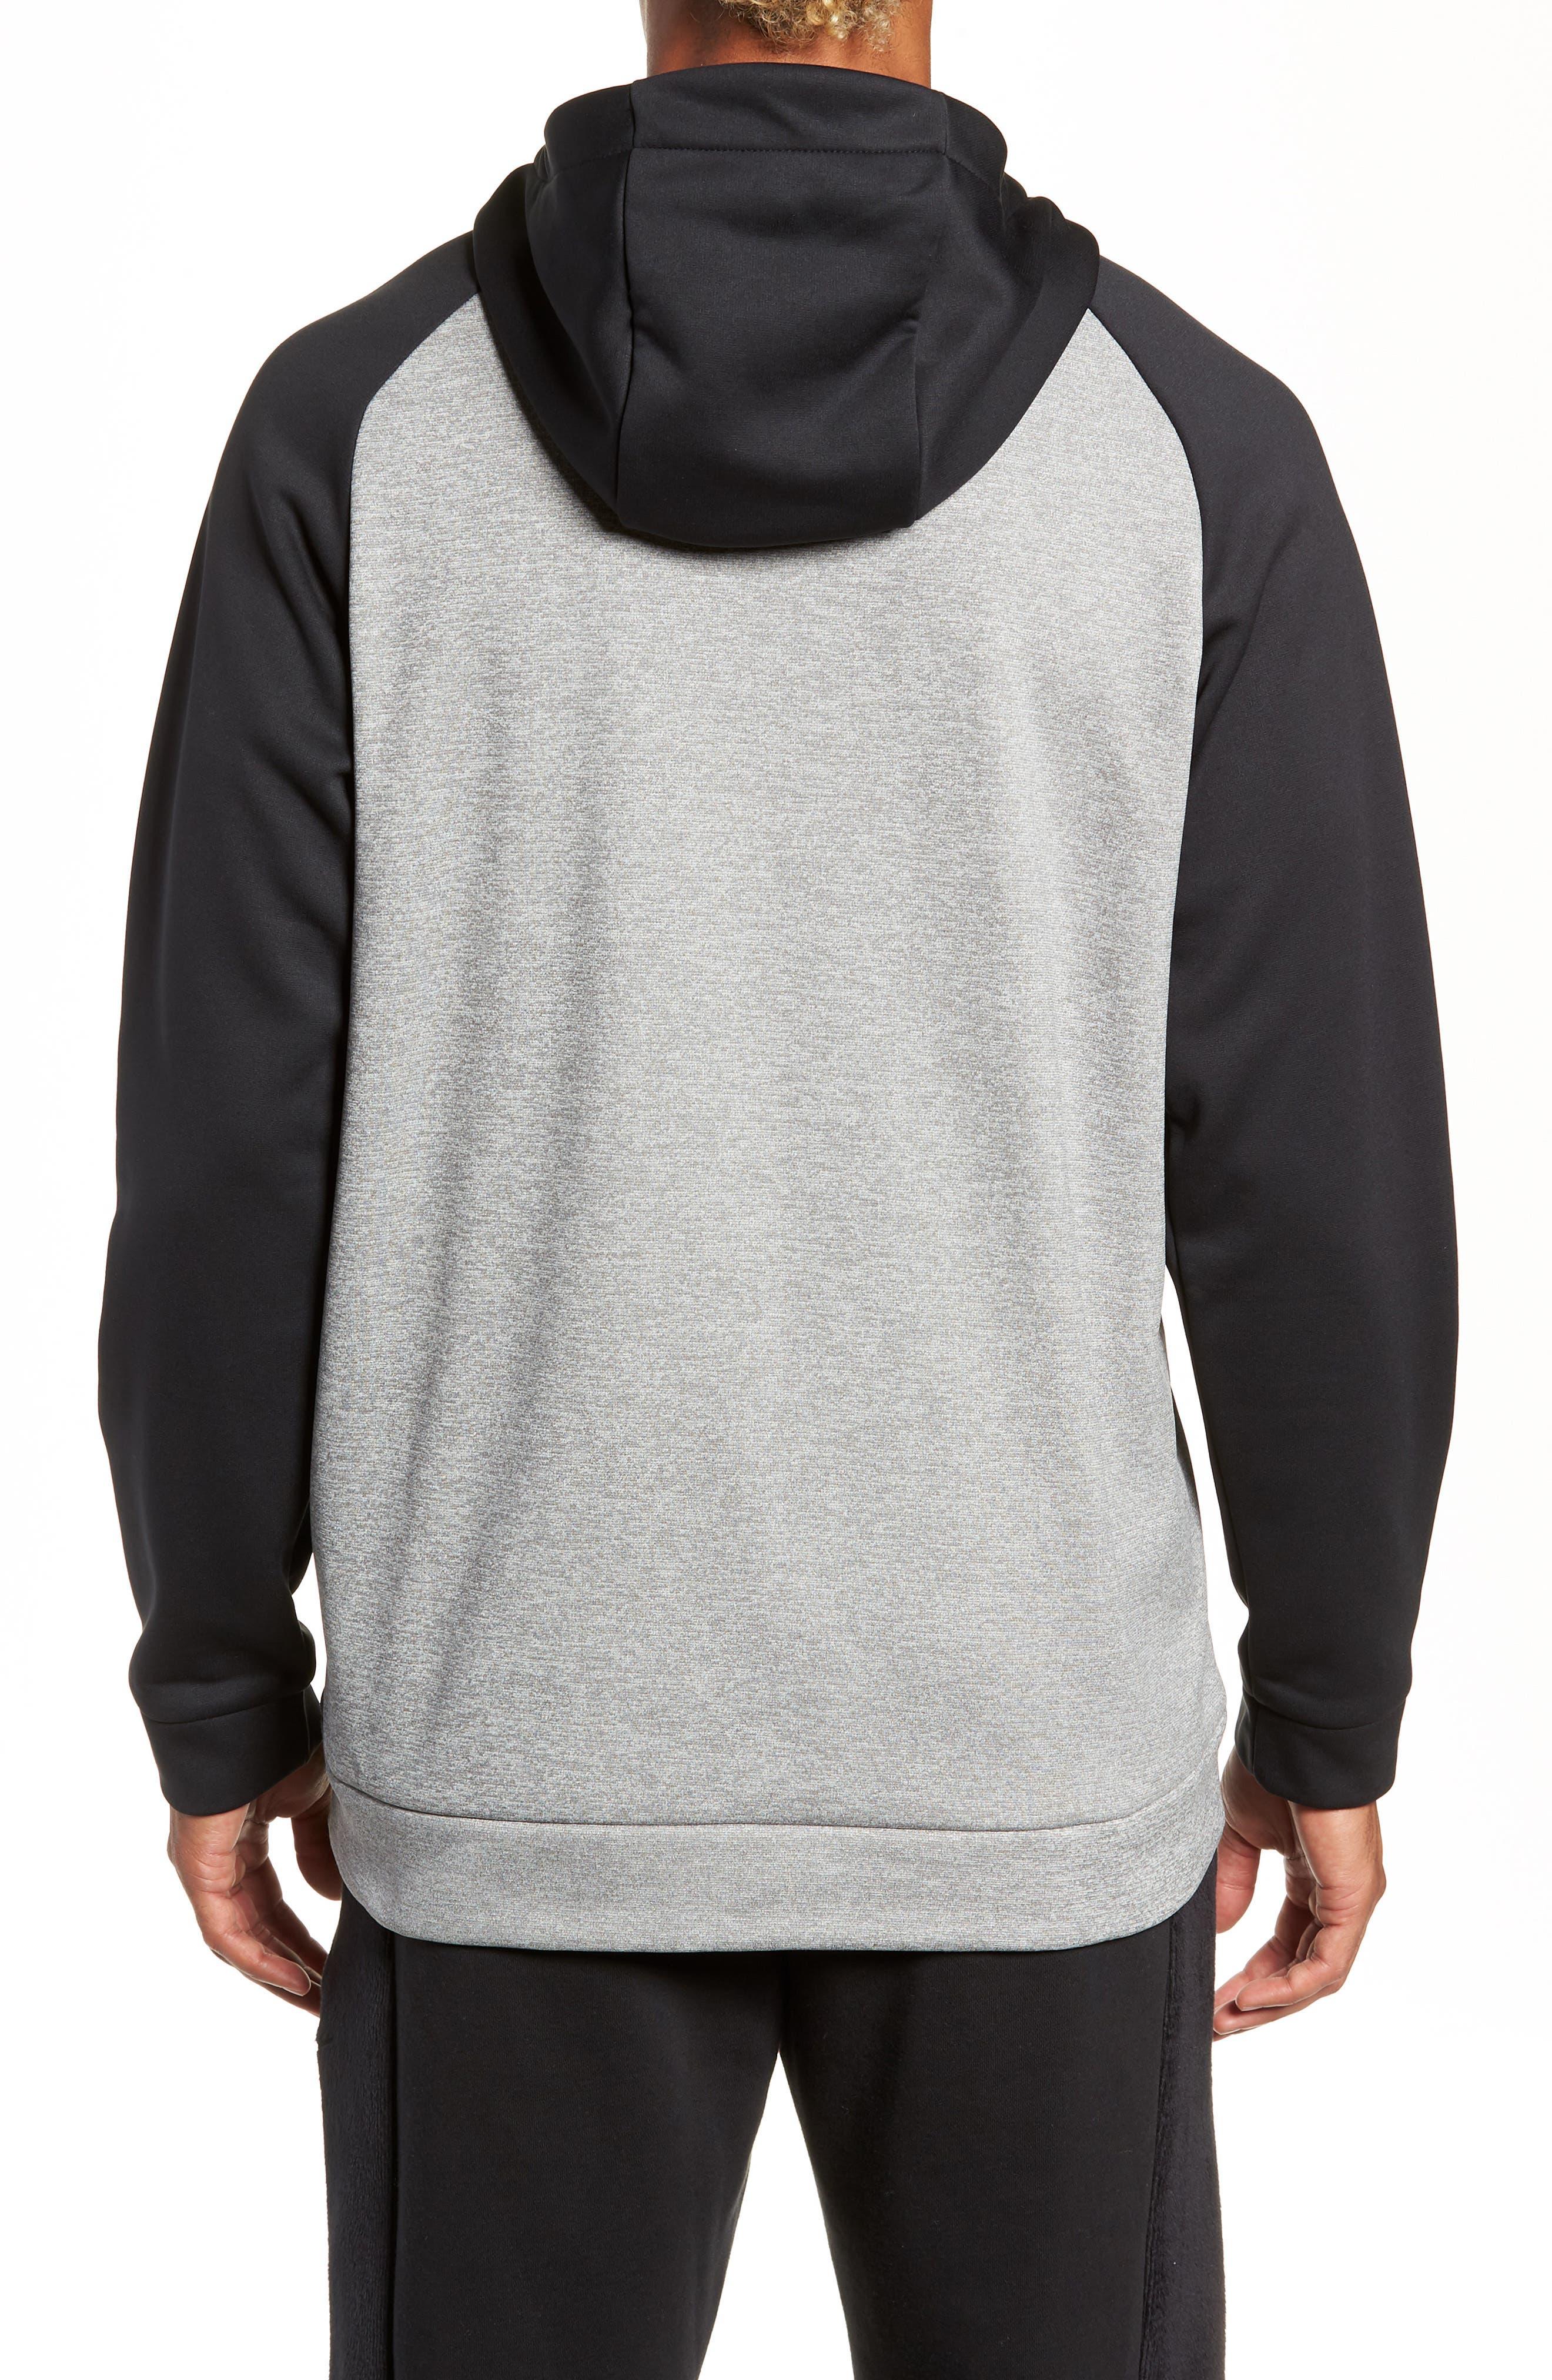 Therma Swoosh Dry Pullover Hoodie,                             Alternate thumbnail 2, color,                             DK GREY HEATHER/ BLACK/ BLACK